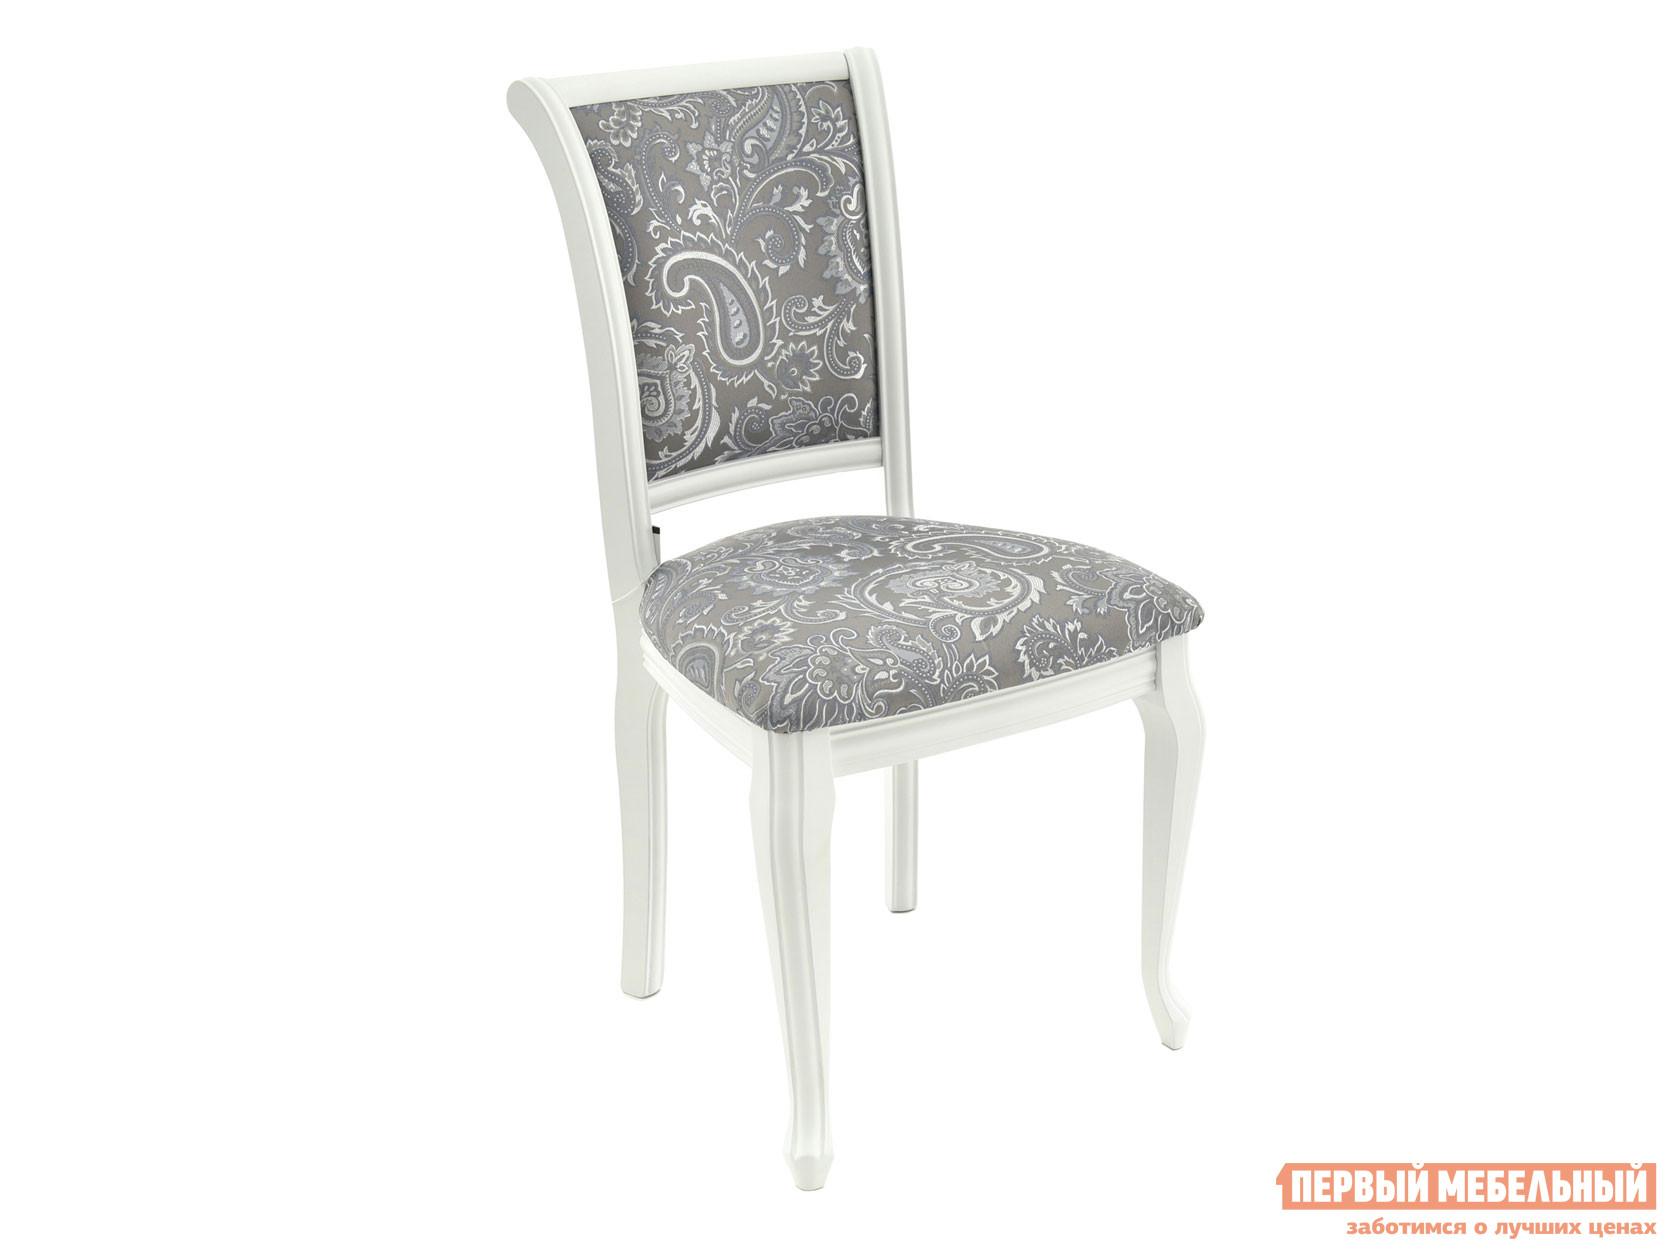 Фото - Стул Mebwill Стул Кабриоль мягкий стул линоторг стул кабриоль жесткий